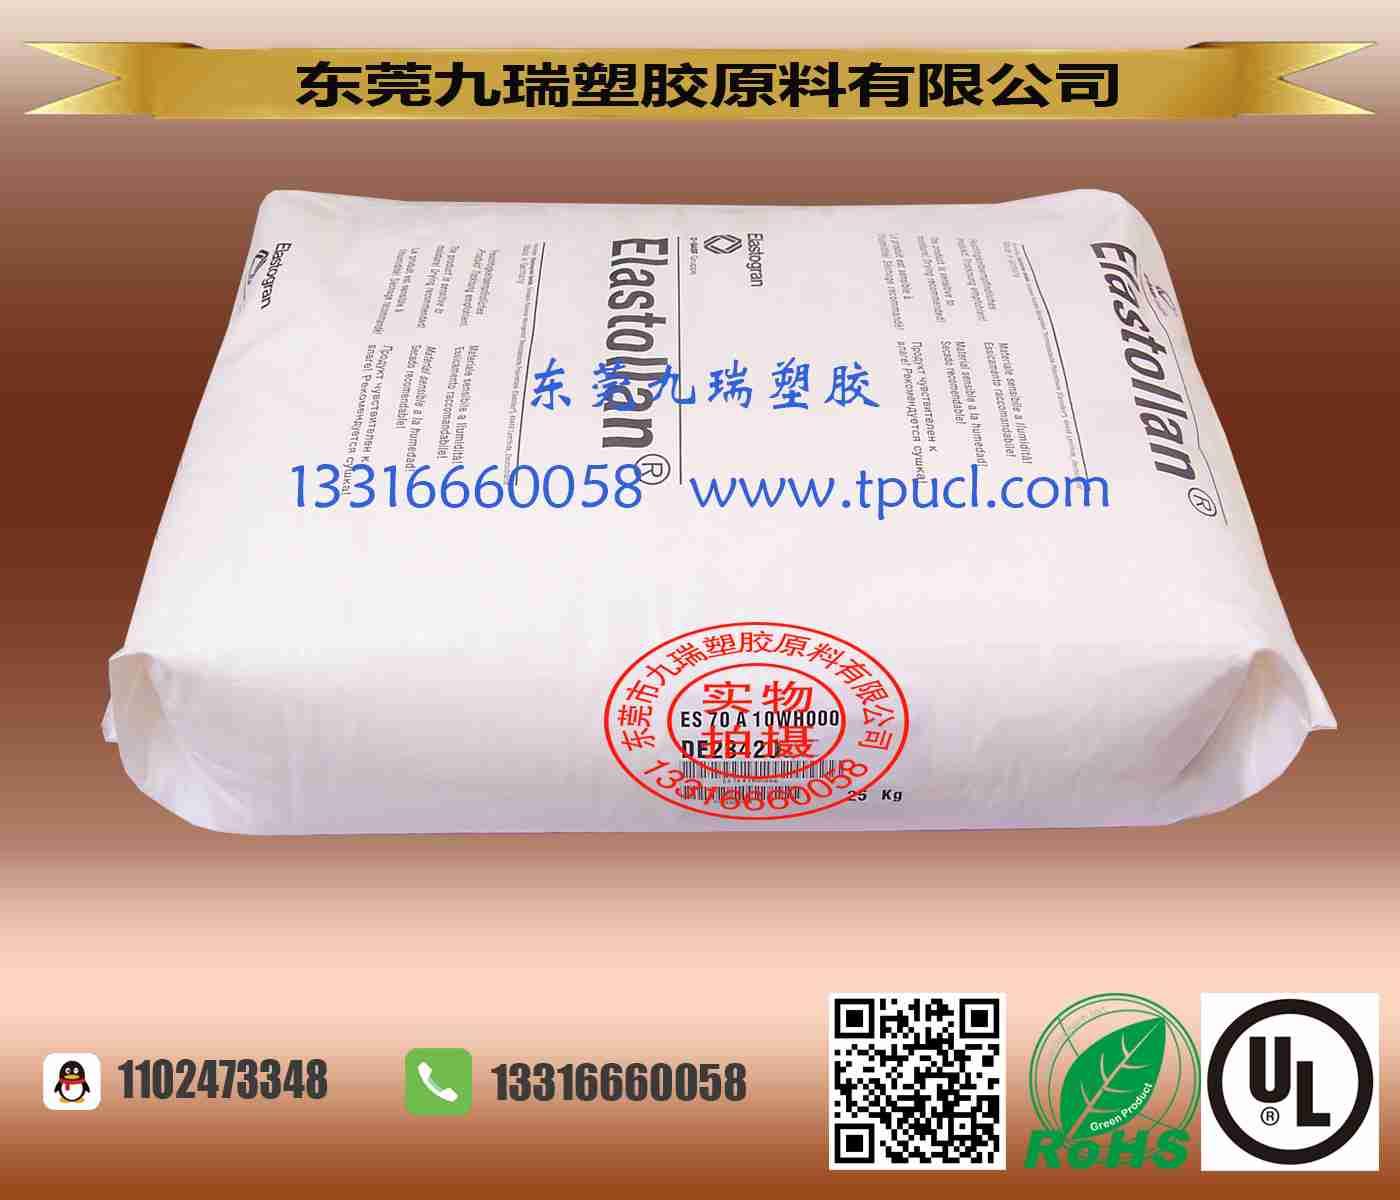 70A柔性抗静电tpu塑胶原料S70A10WH000